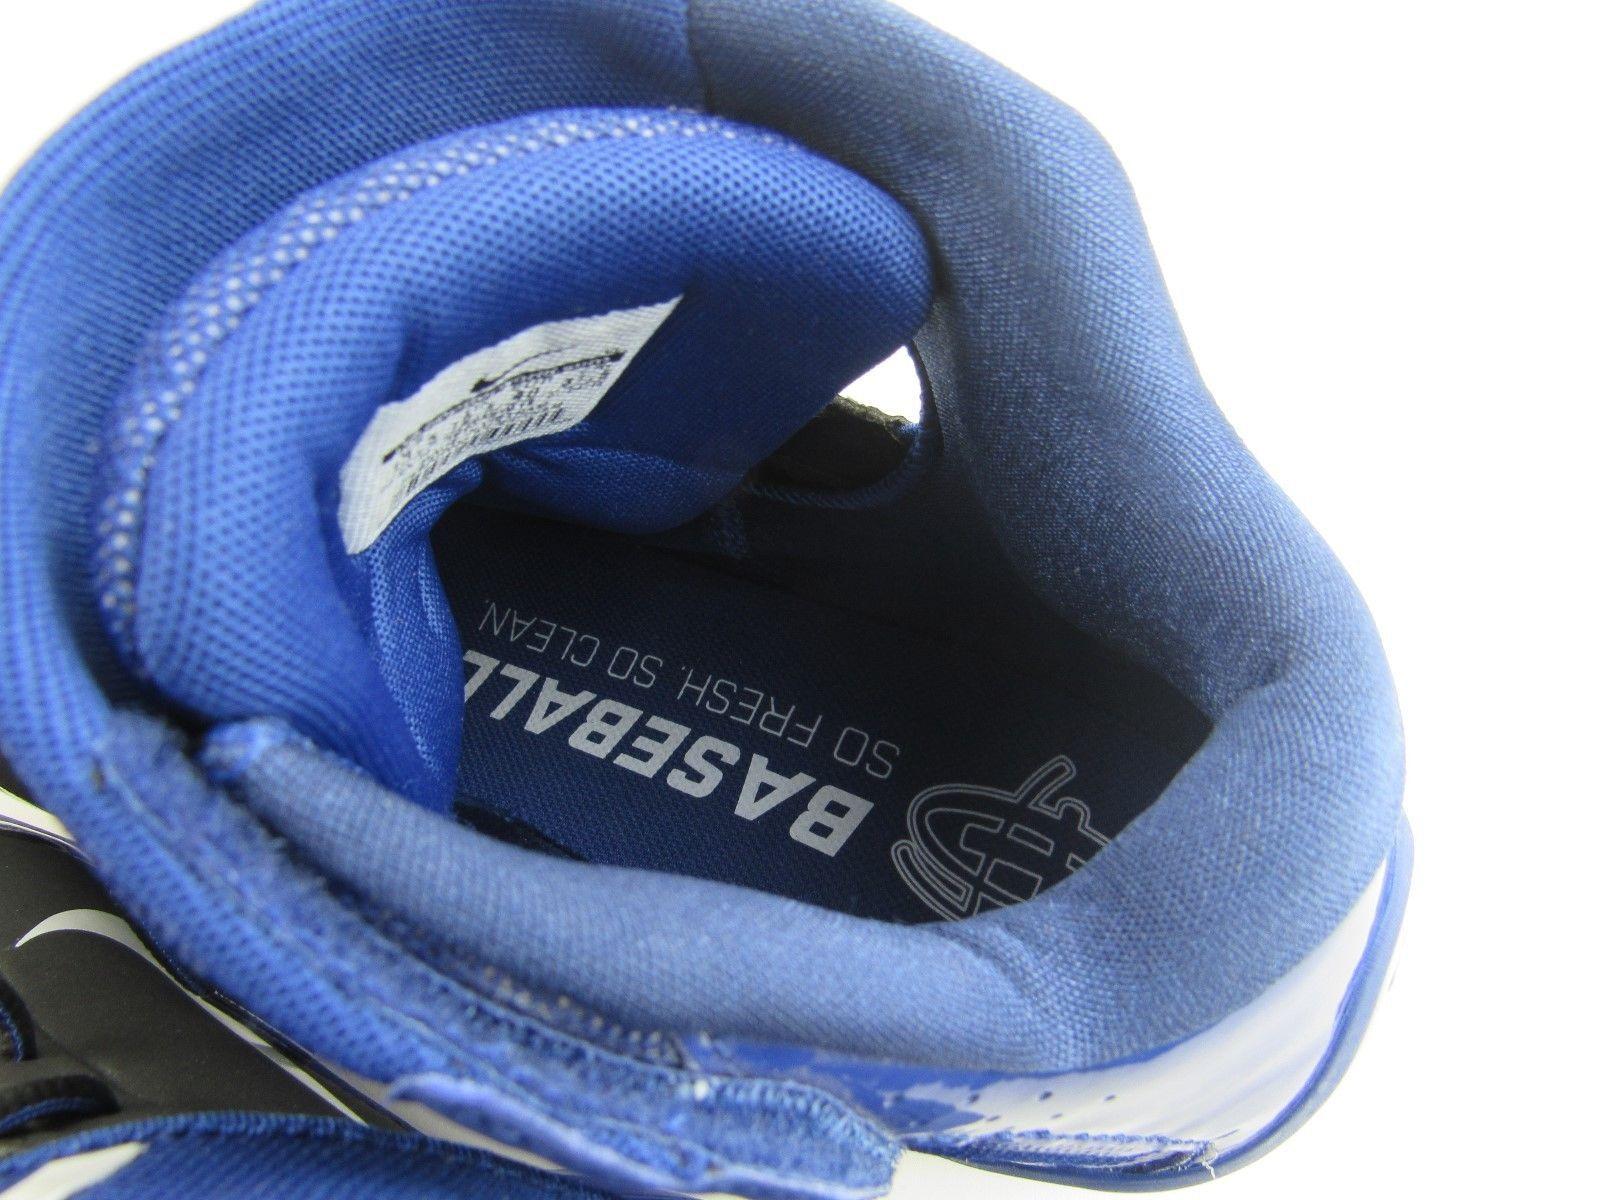 54fd15b0d30e3 Nike Huarache Pro Mid Metal Baseball Cleats 599235 014 MSRP  95 Men s Size  13.5